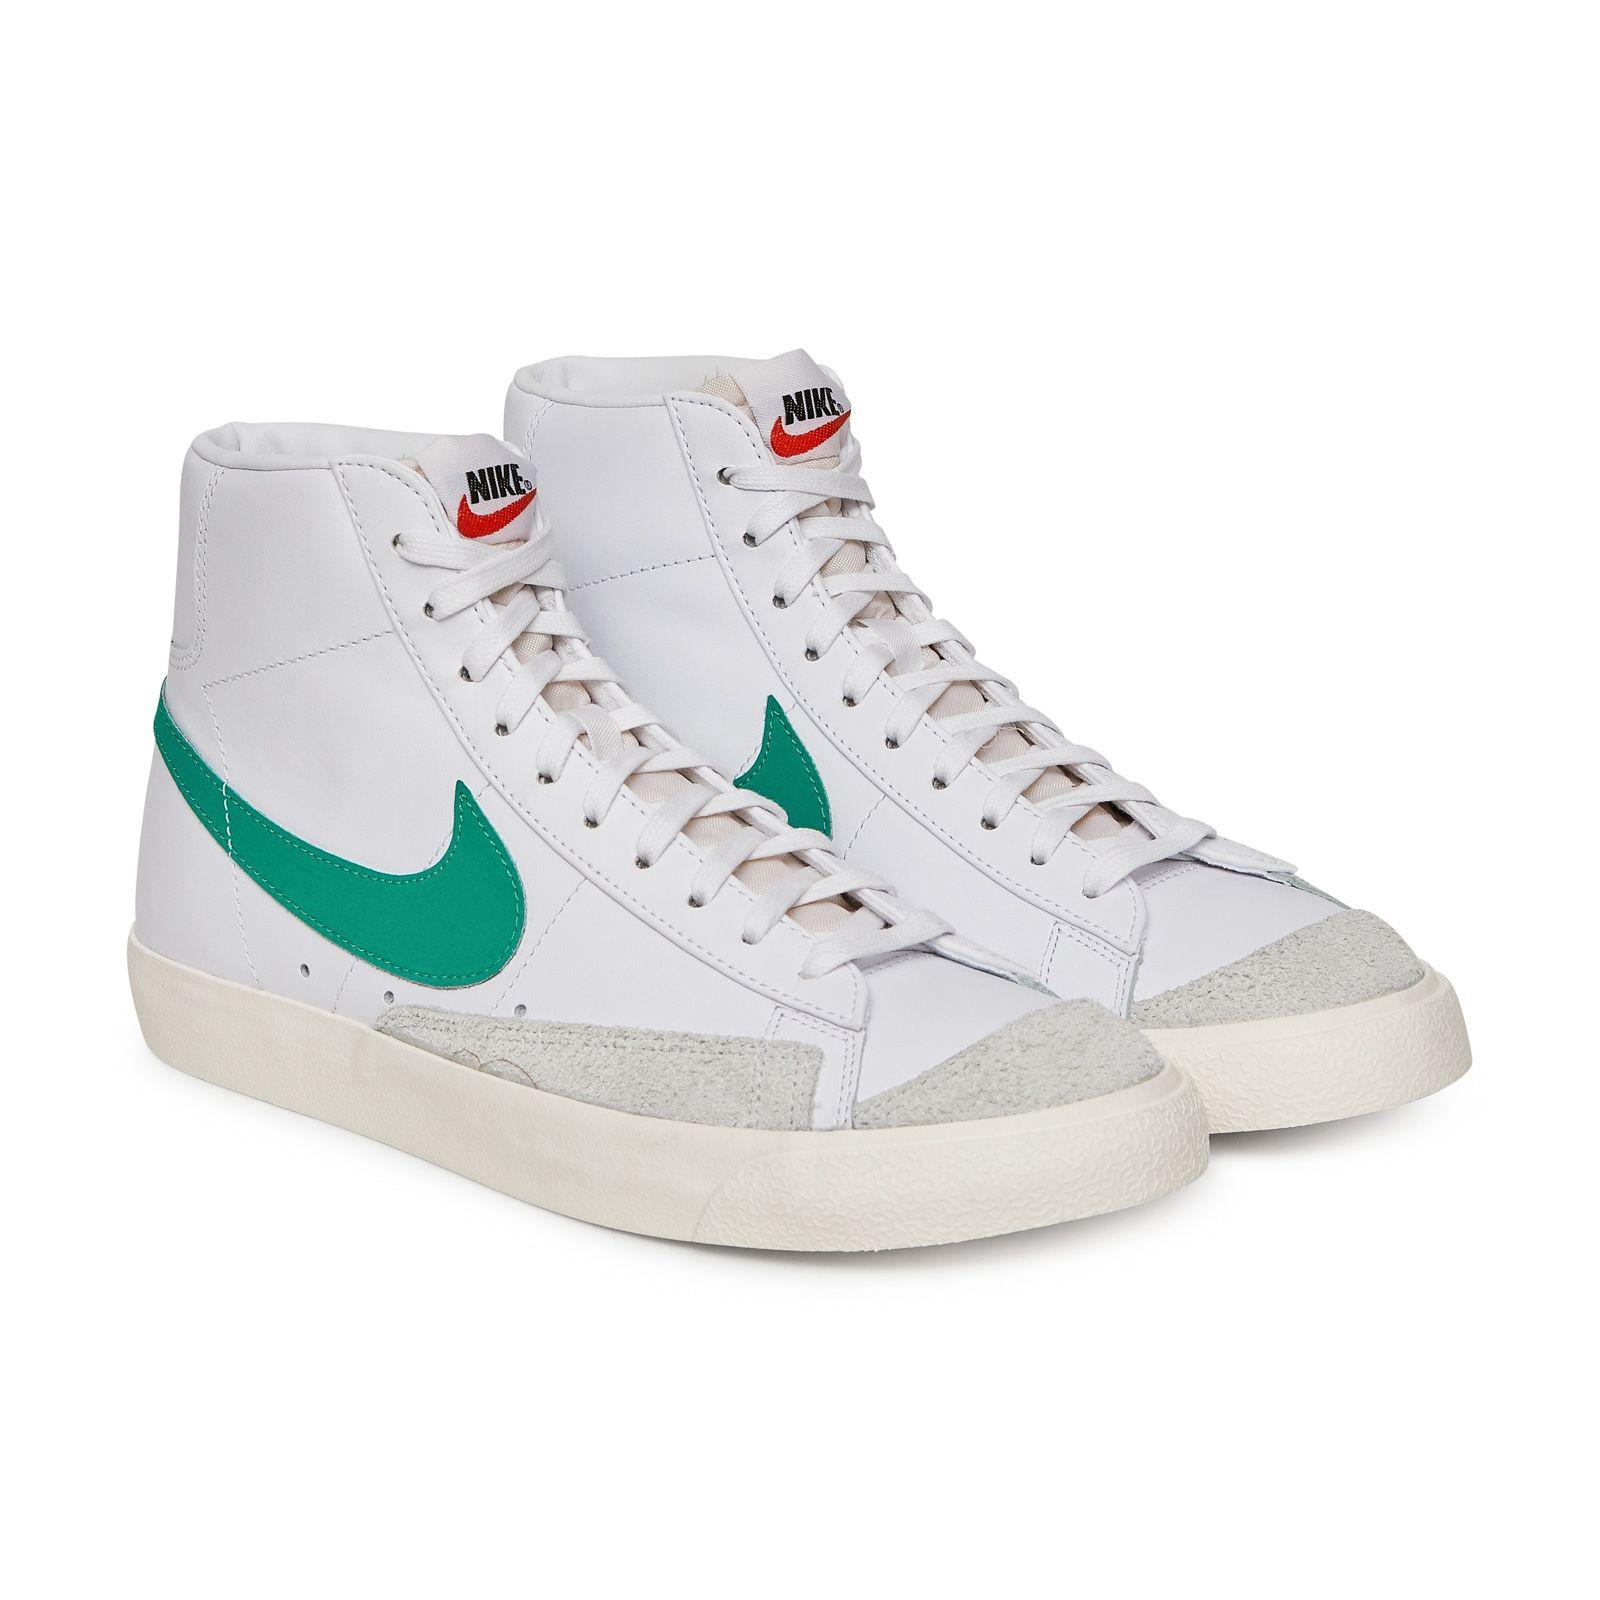 Blazer Mid '77 Vintage Sneakers | Sneakers men fashion ...